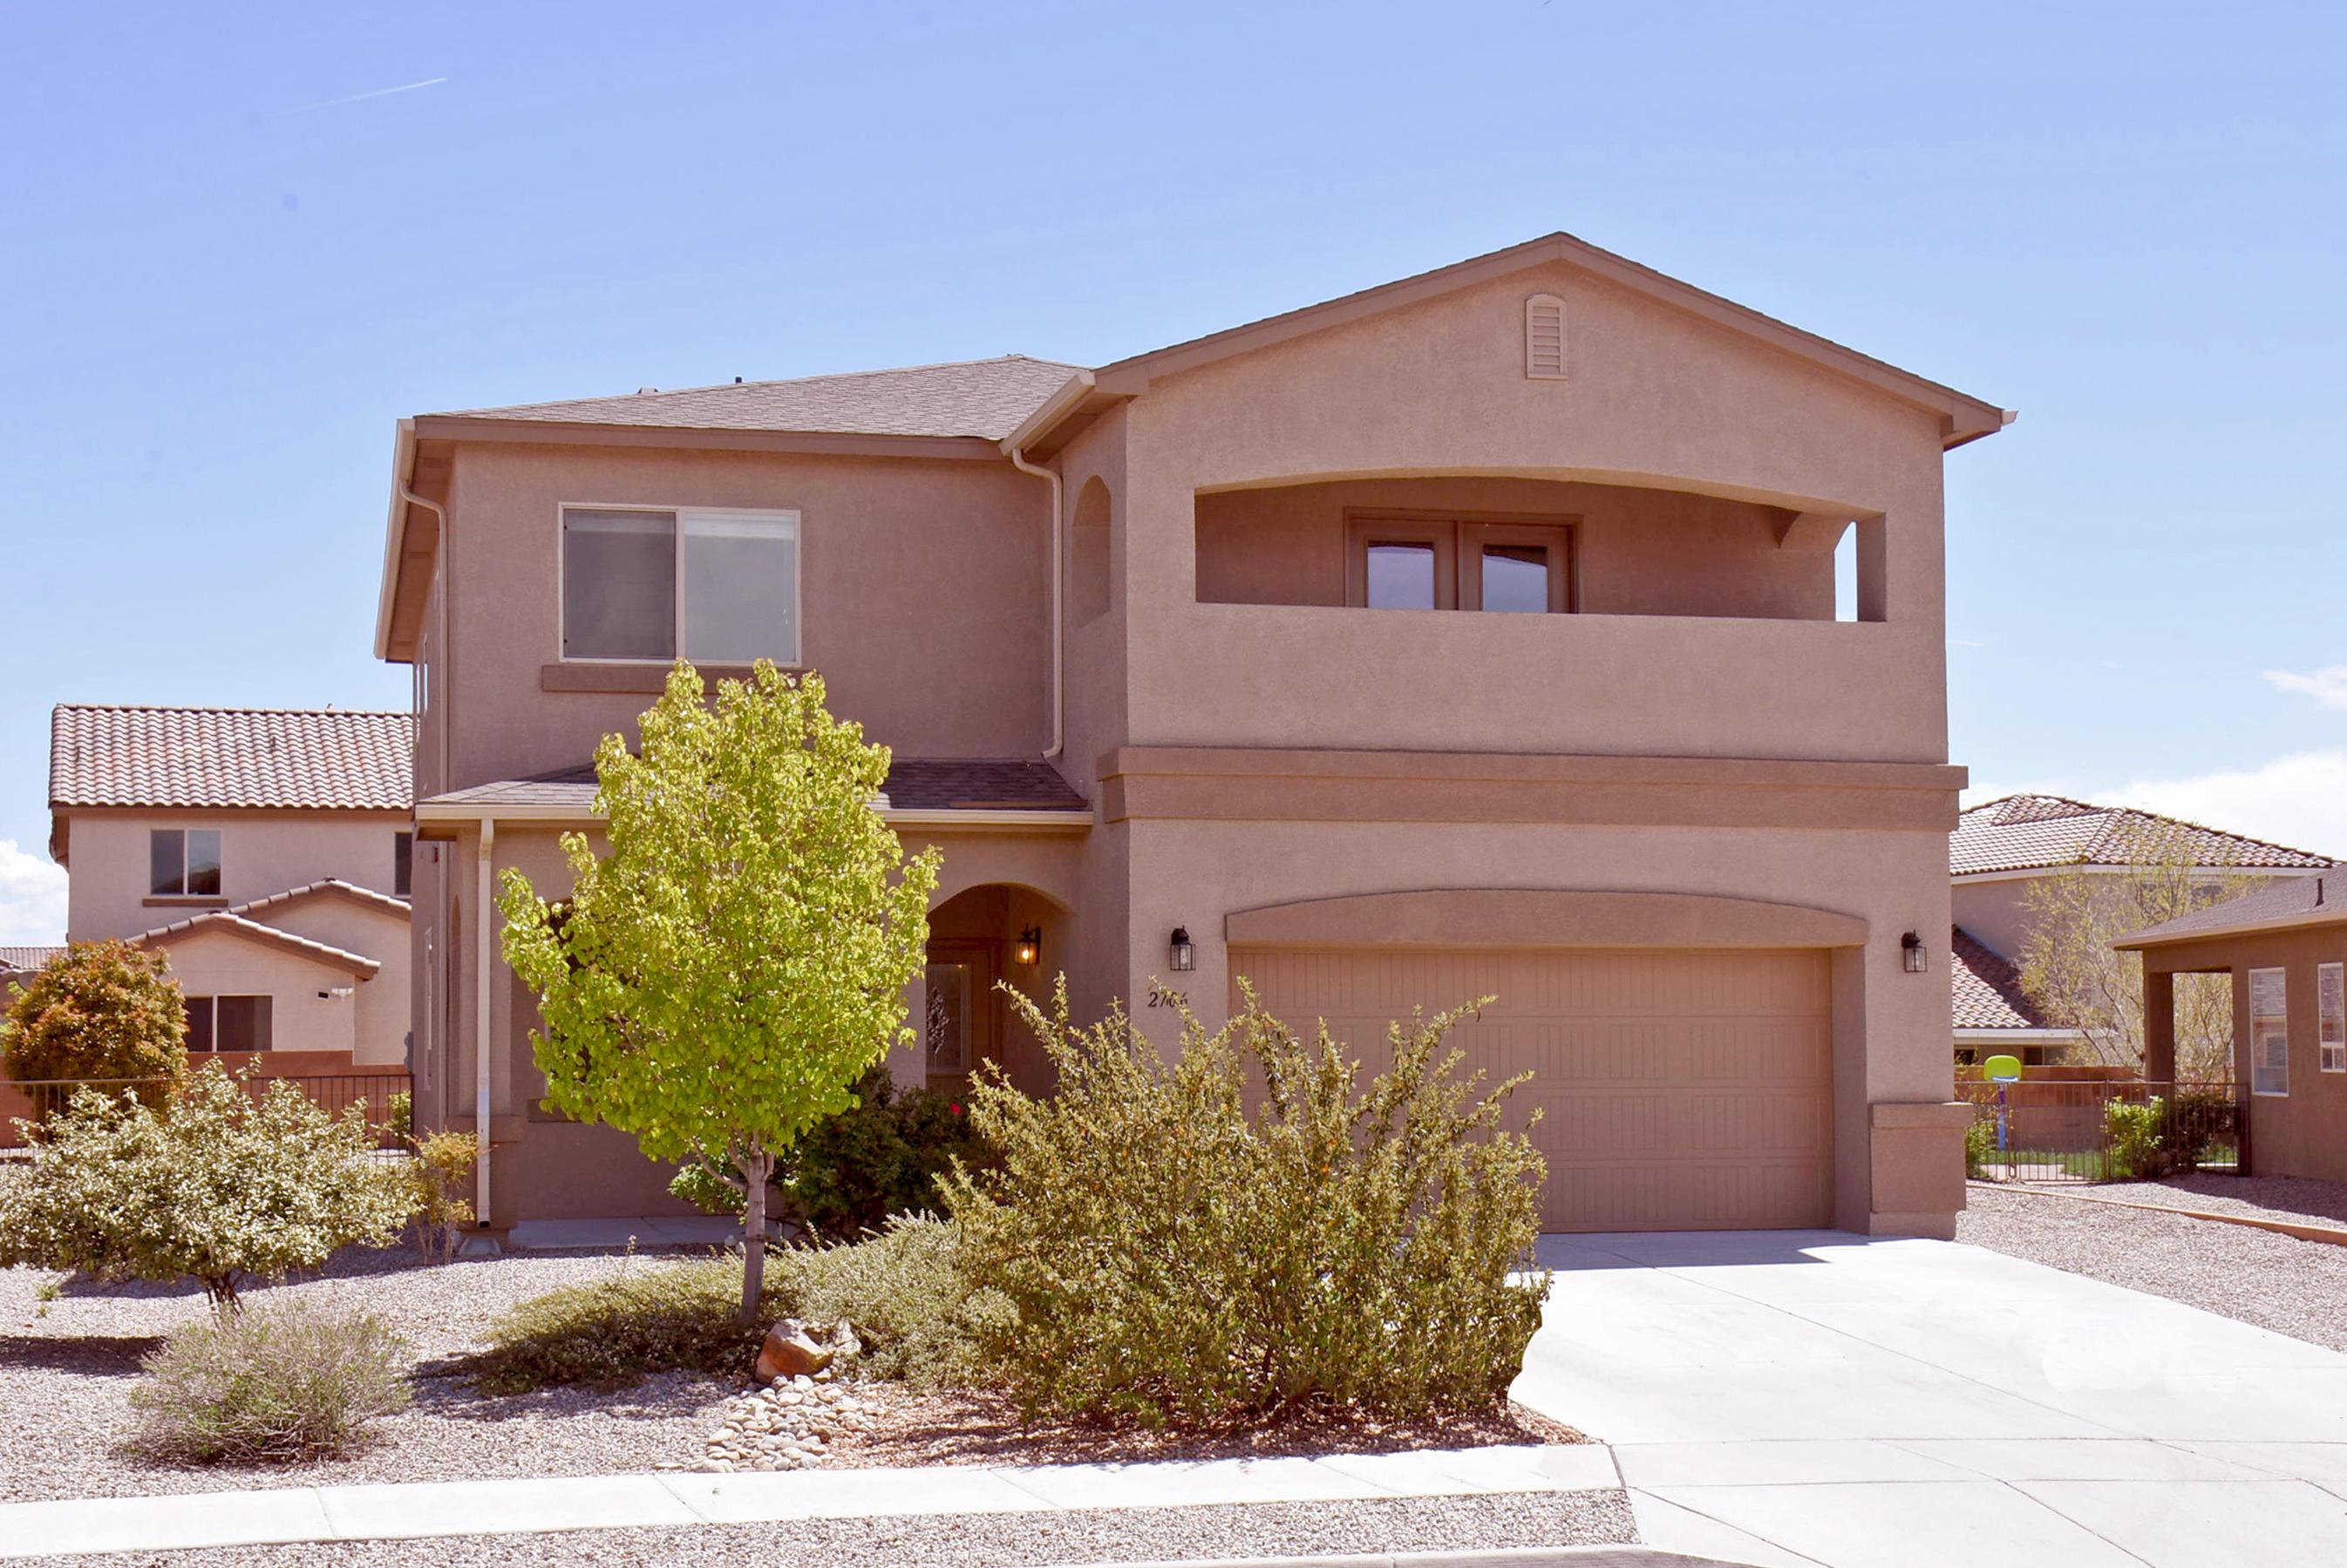 2706 SE Camacho Road, Rio Rancho, New Mexico